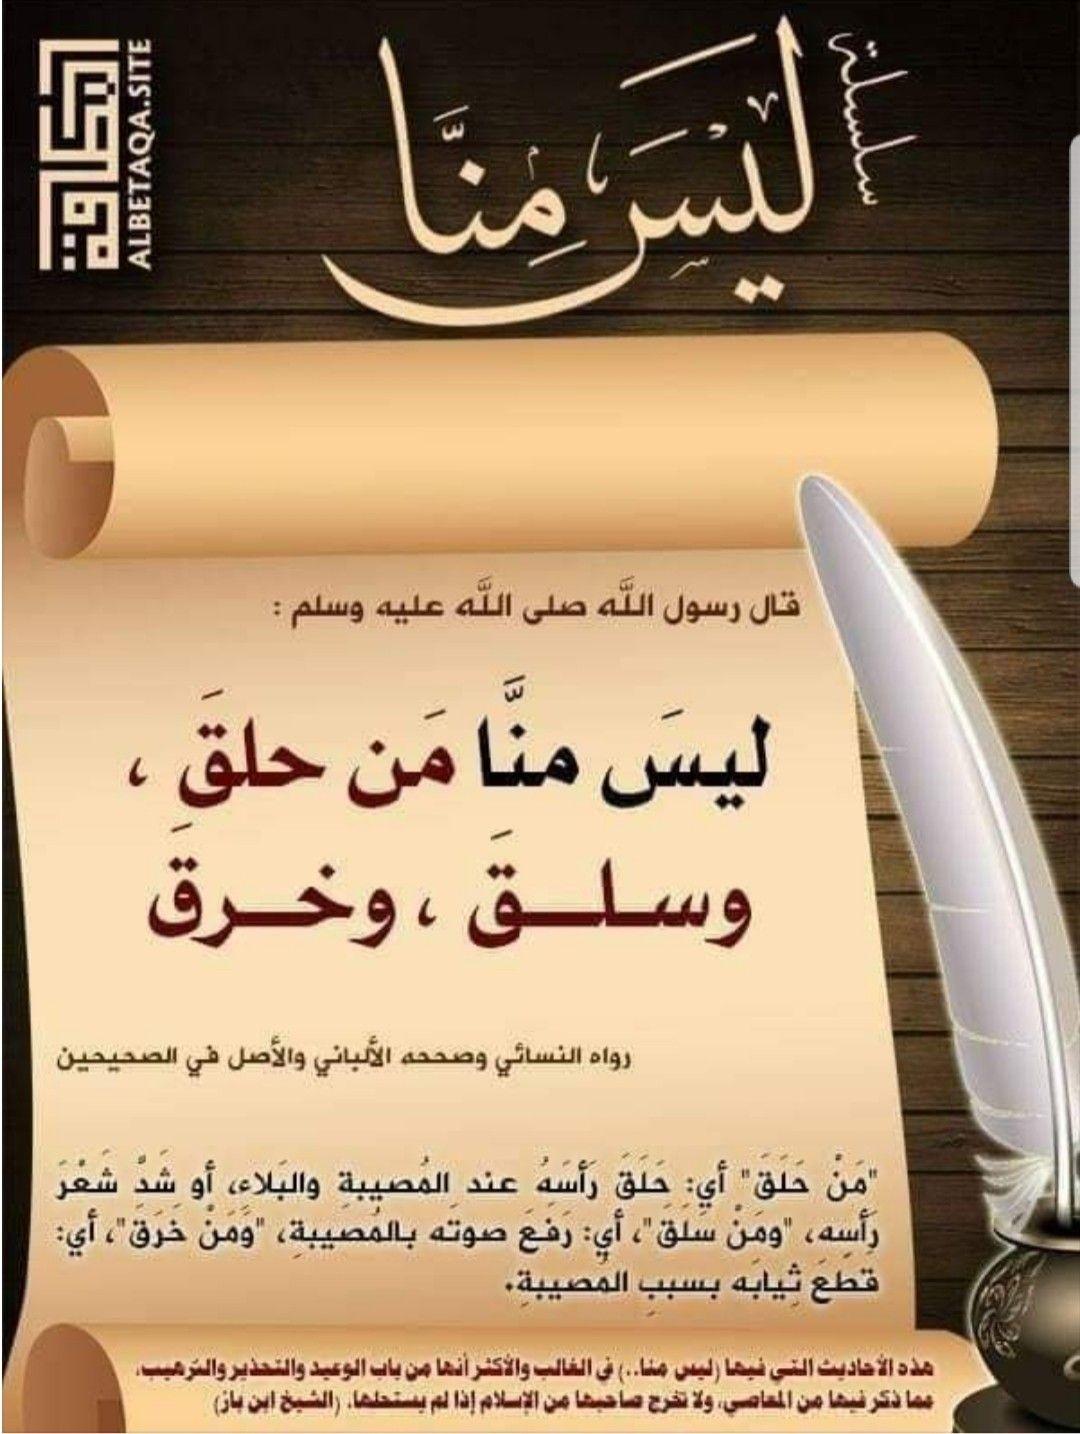 Pin By Husam On احاديث نبويه شريفه Islam Facts Islam Beliefs Hadith